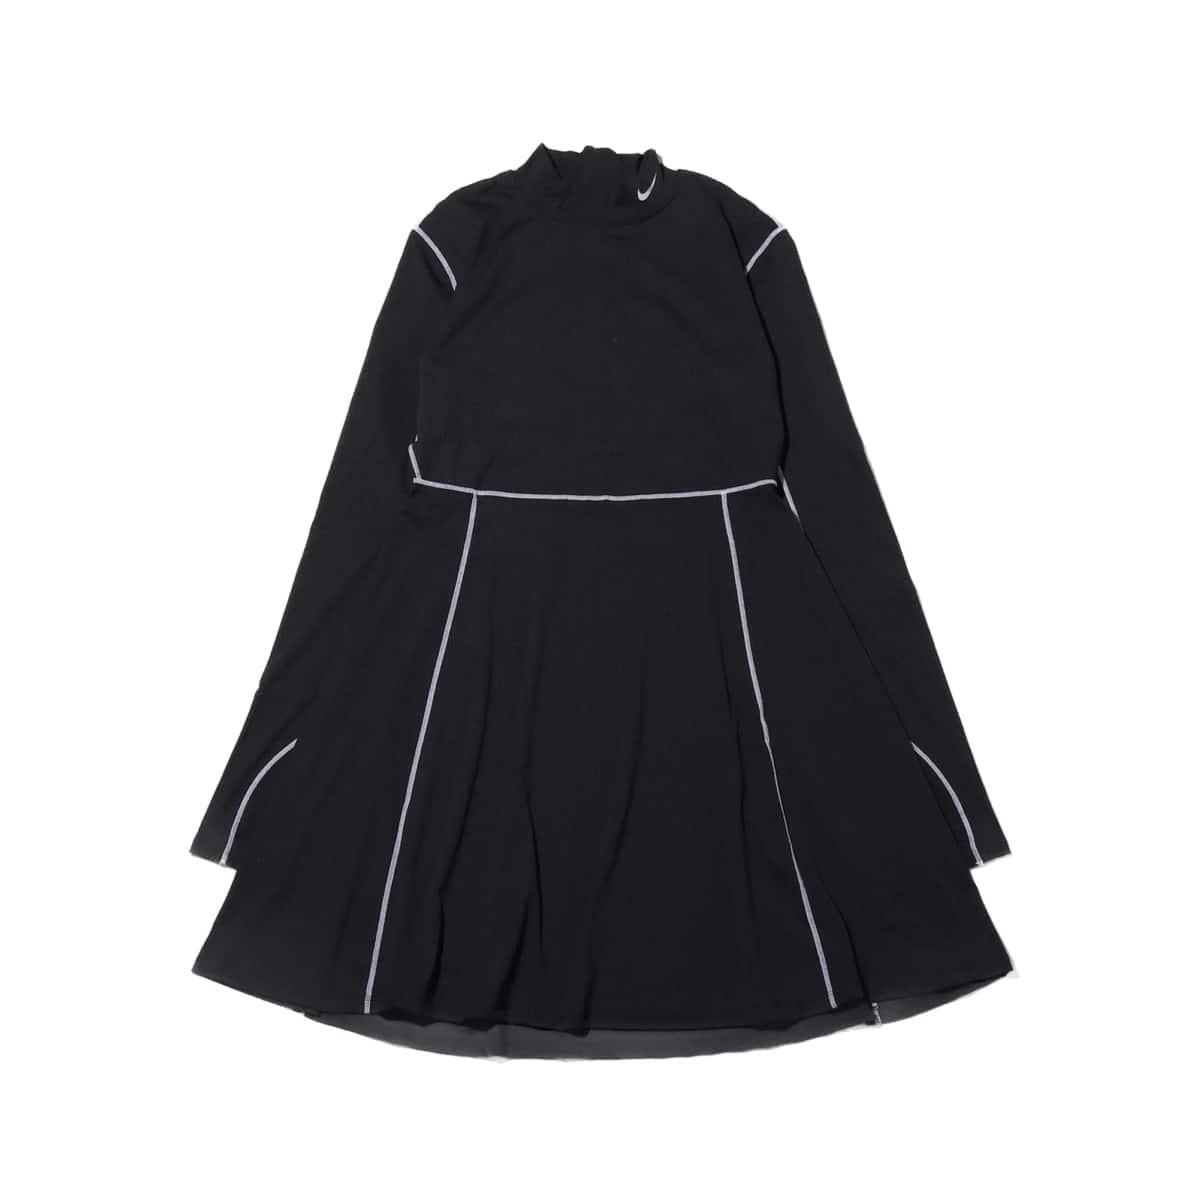 NIKE W NRG NXN TENNIS DRESS BLACK 19HO-S_photo_large